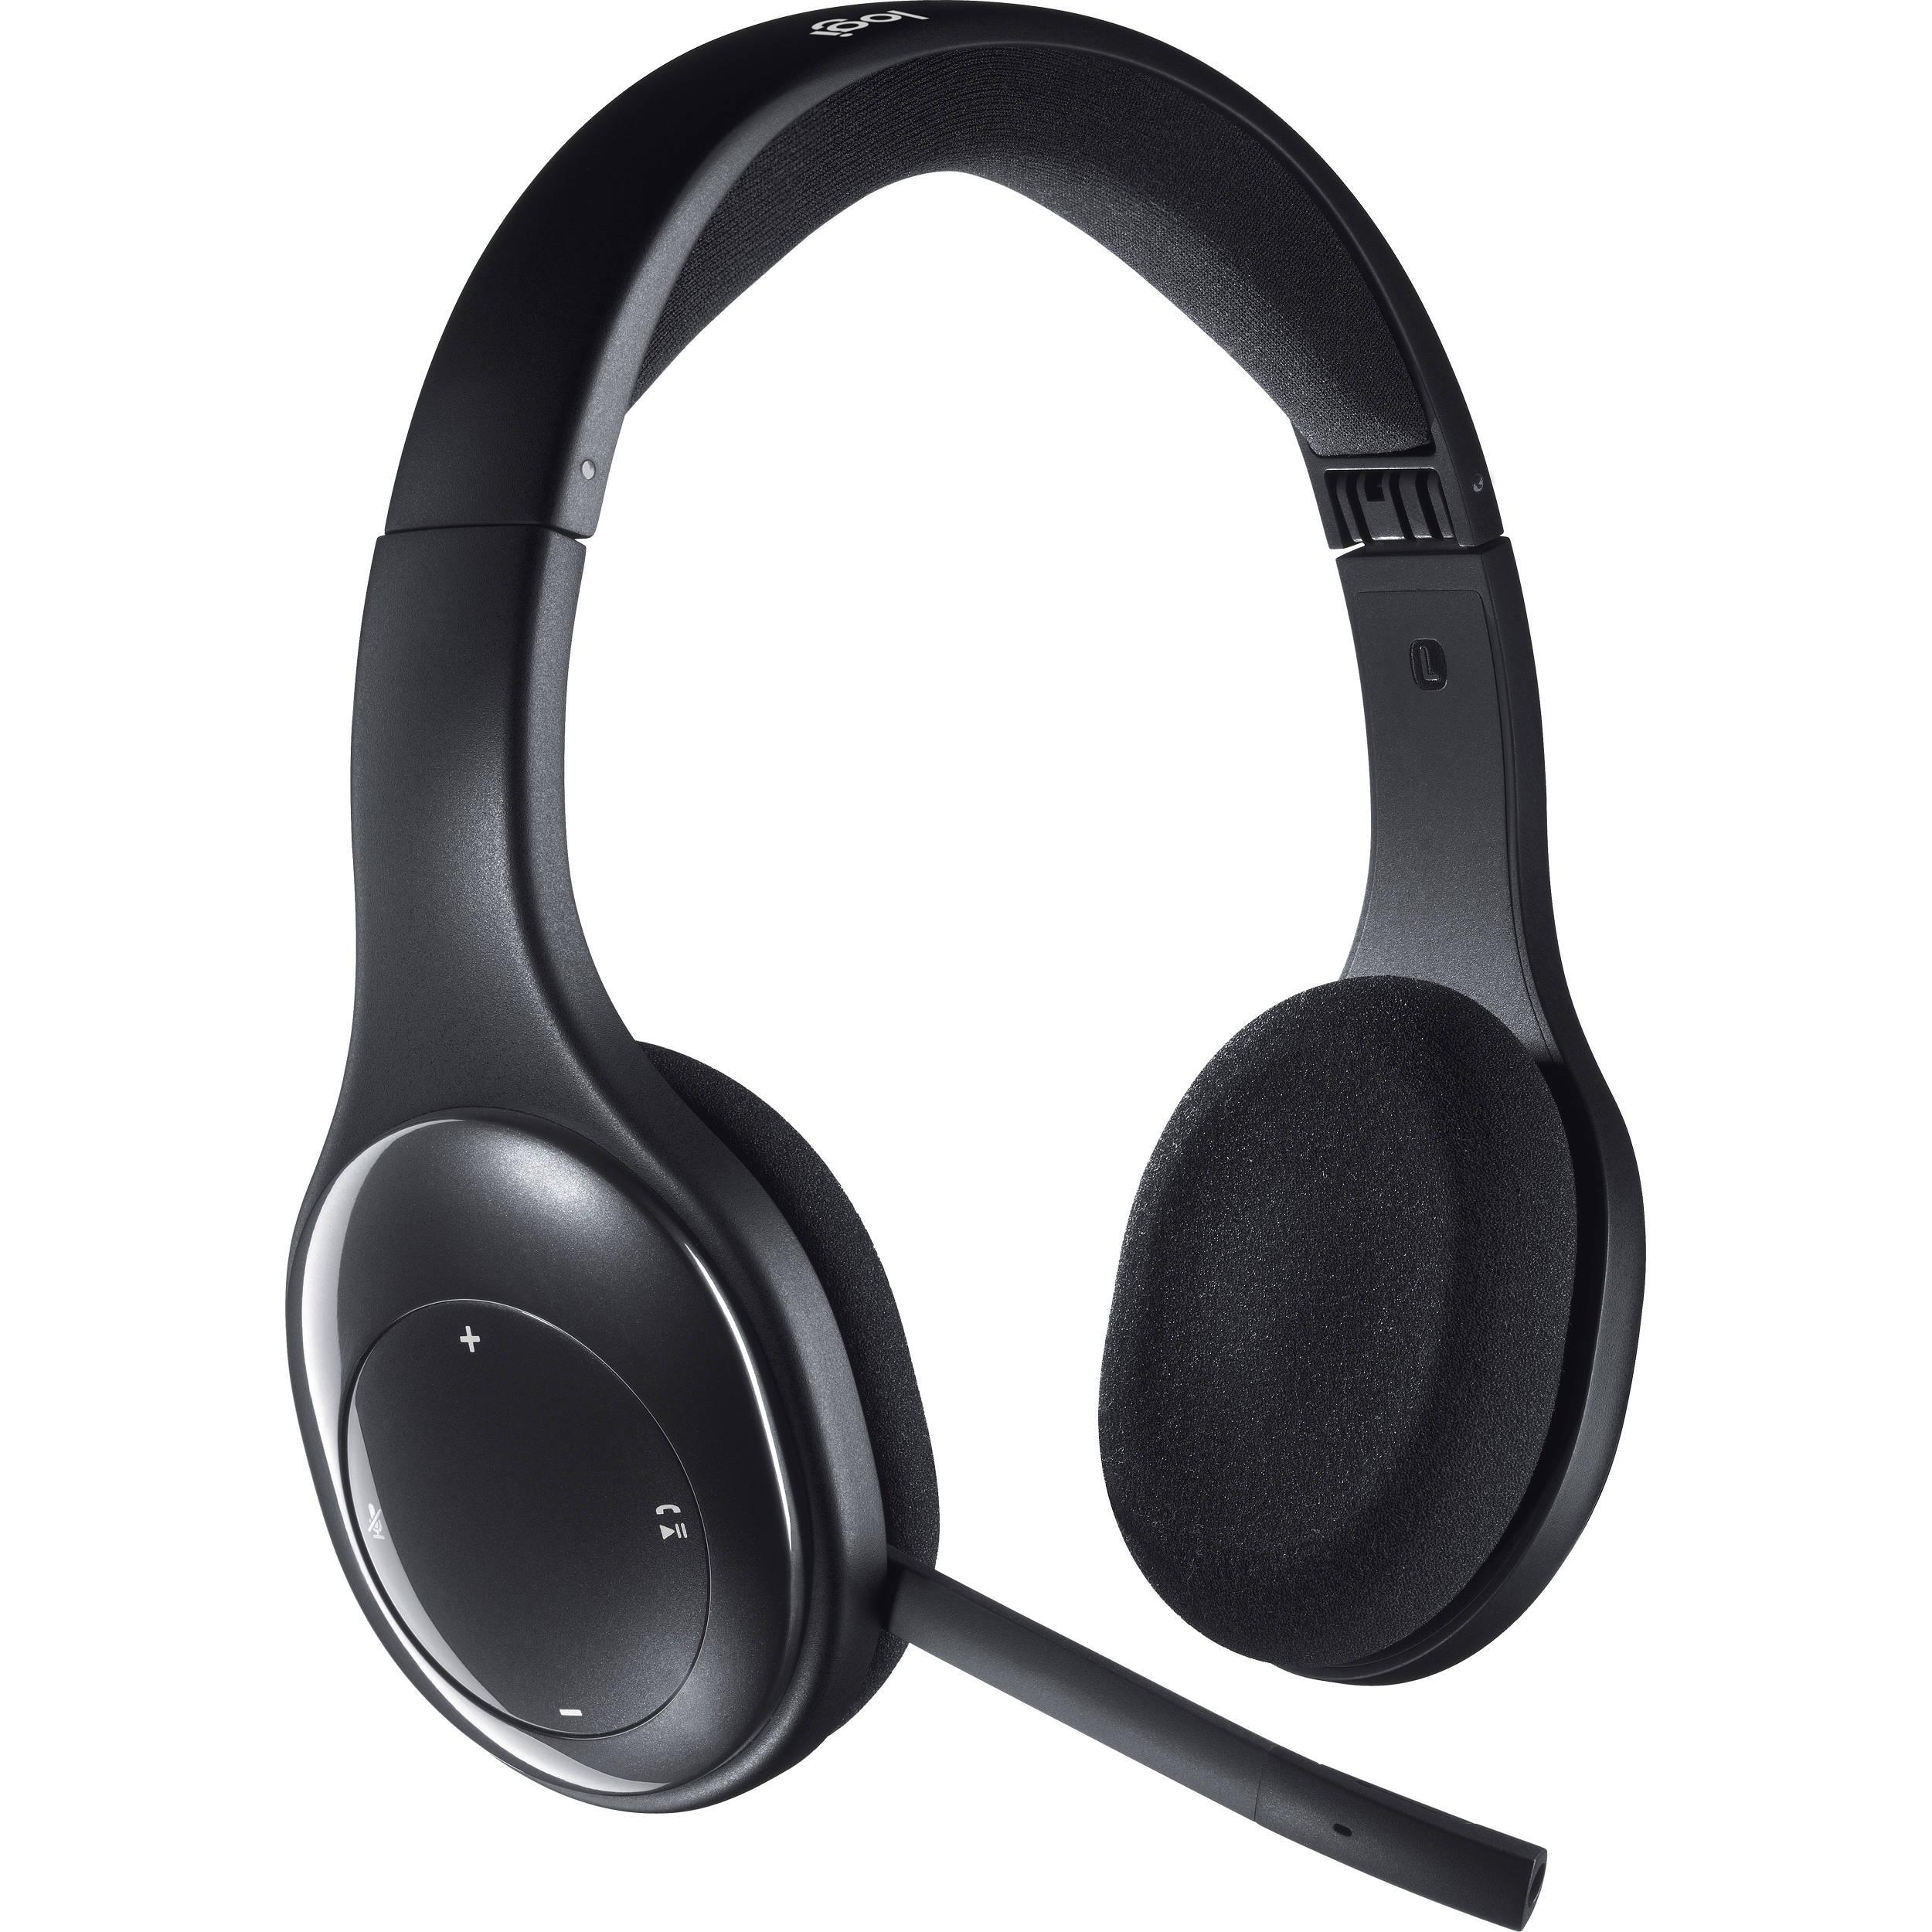 designer fashion 5539a 11000 Logitech H800 Wireless Stereo Headset